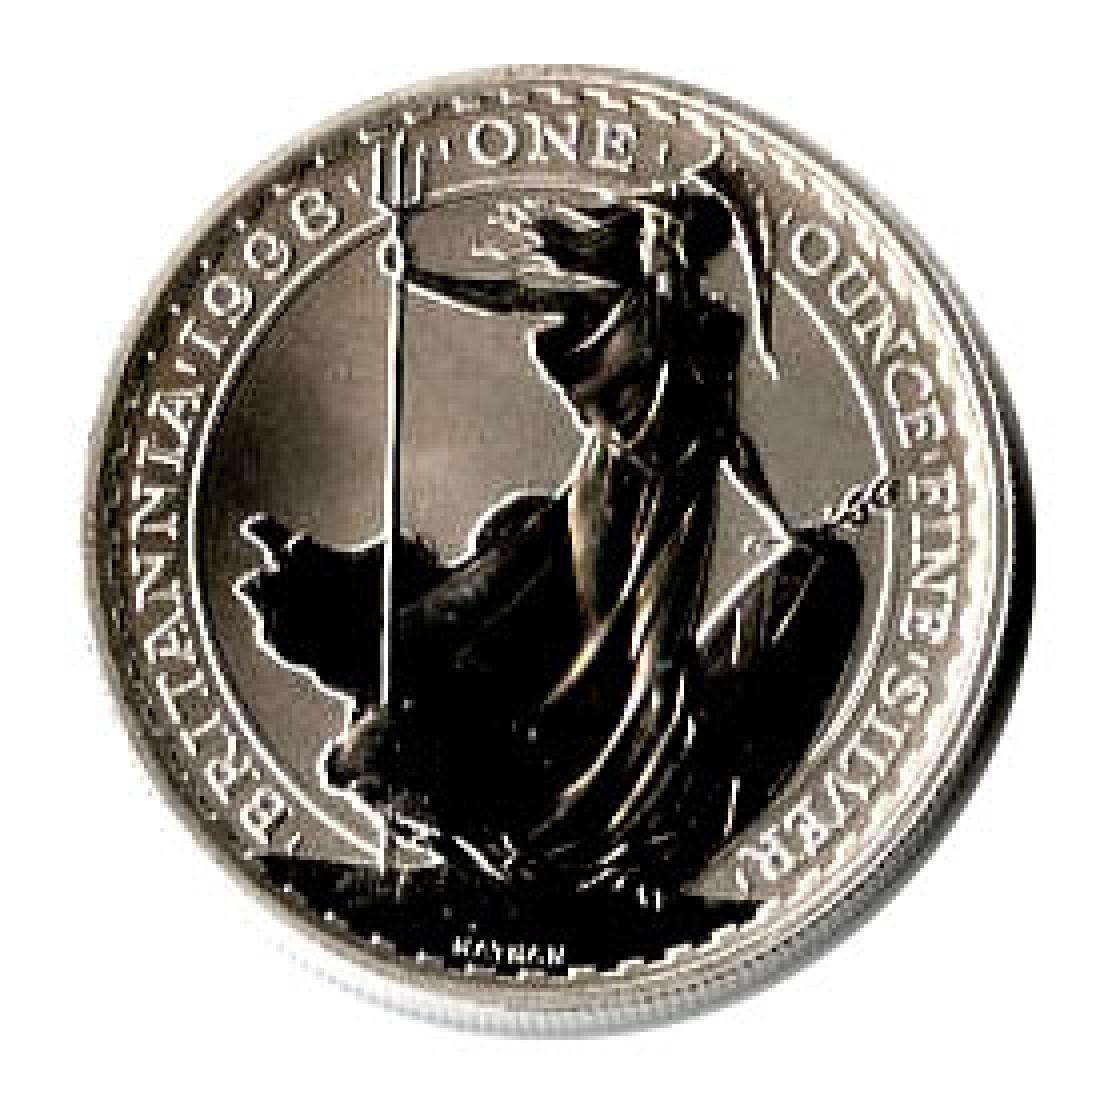 Uncirculated Silver Britannia 1 oz 1998